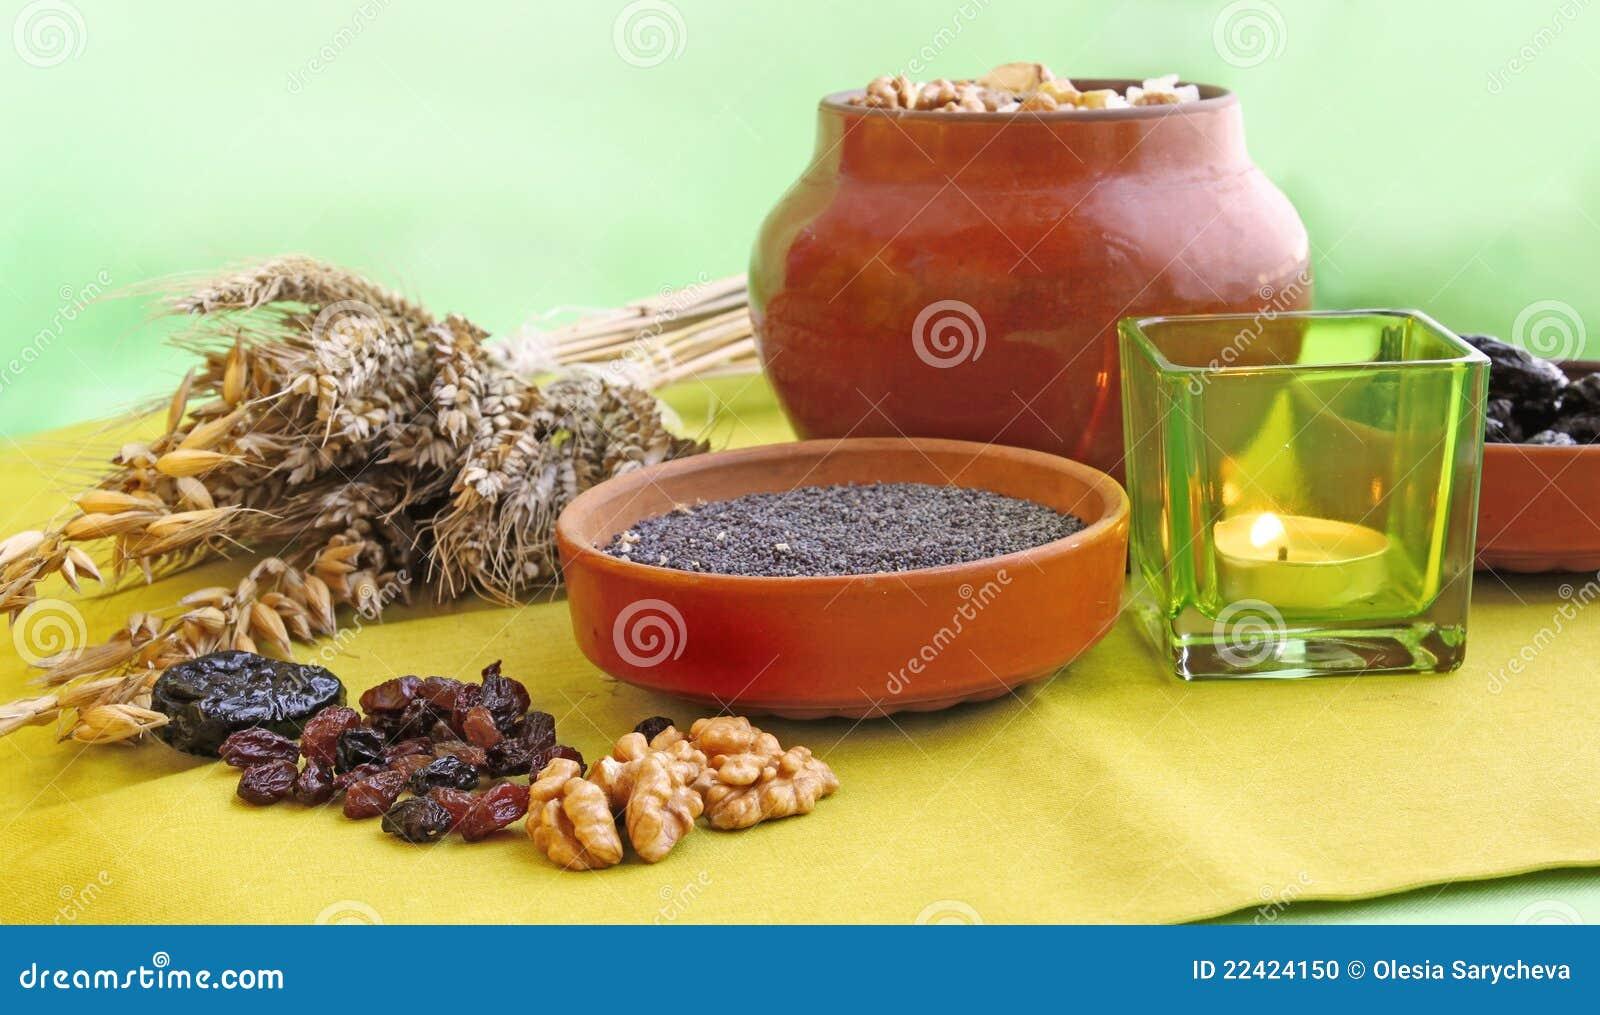 how to prepare russian porridge oats